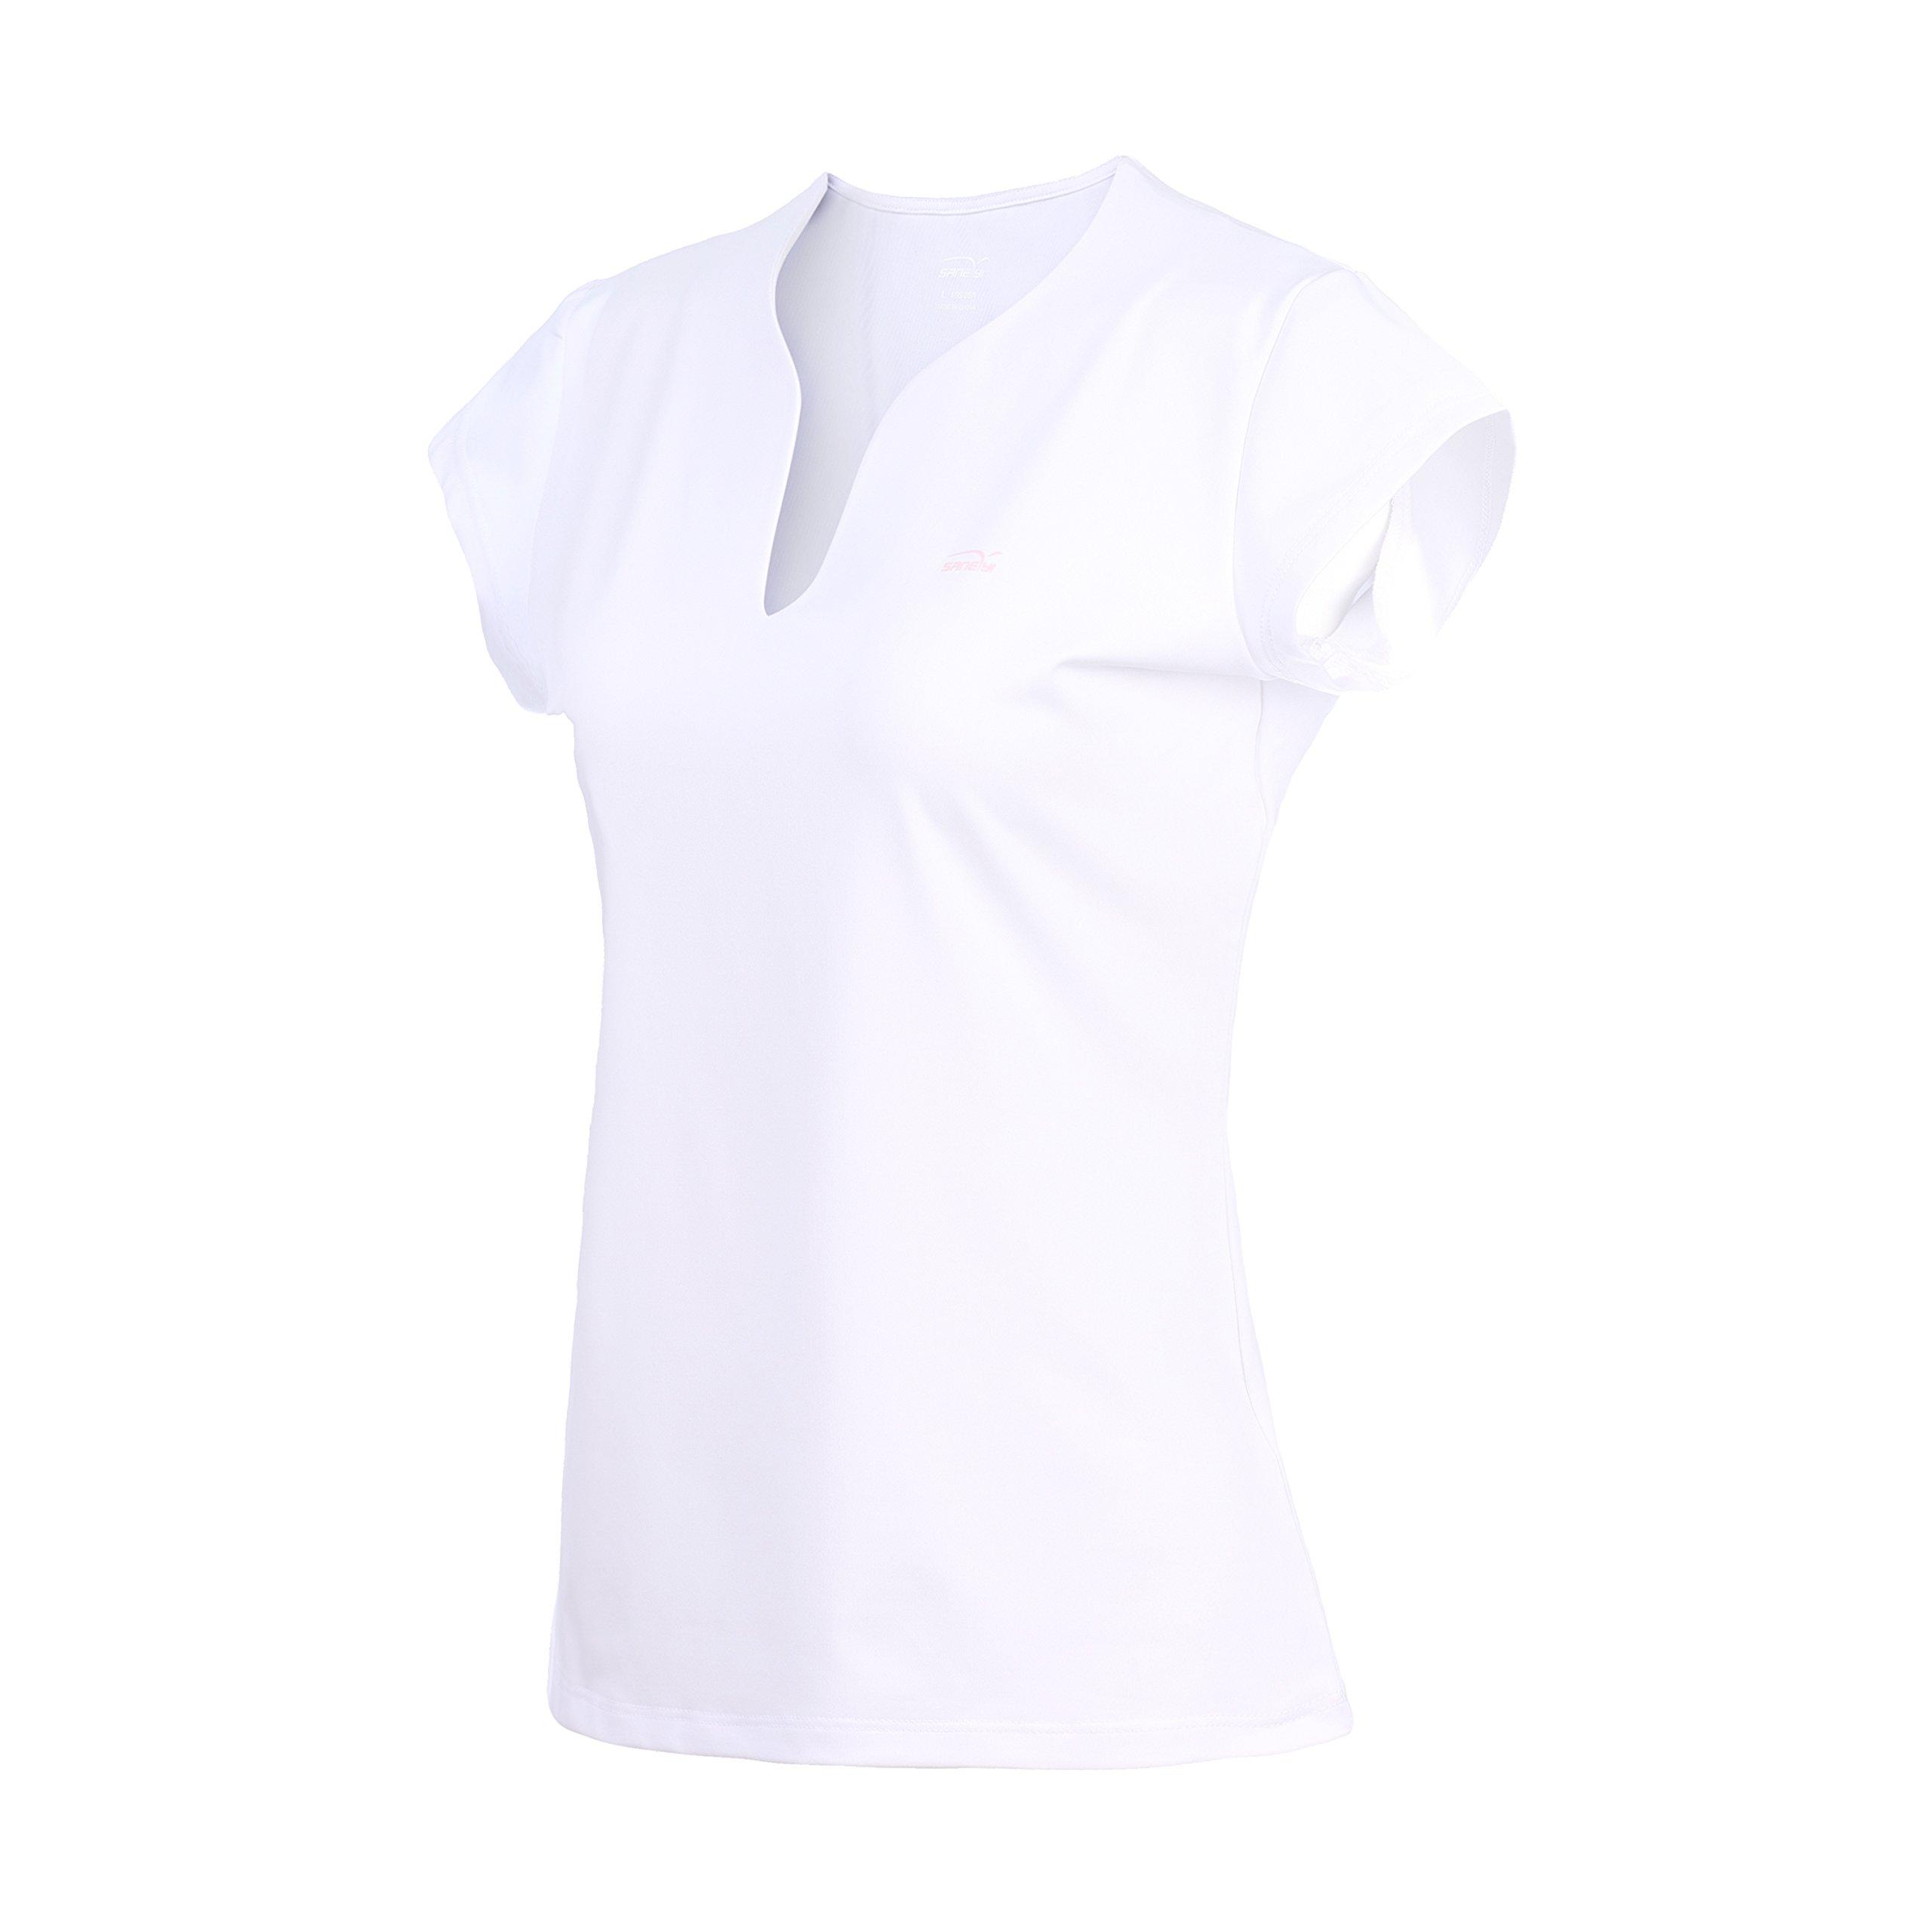 32e-SANERYI Women's Quick-Drying V-Neck Short Sleeve Tees, Badminton Shirts (t42,M,White)